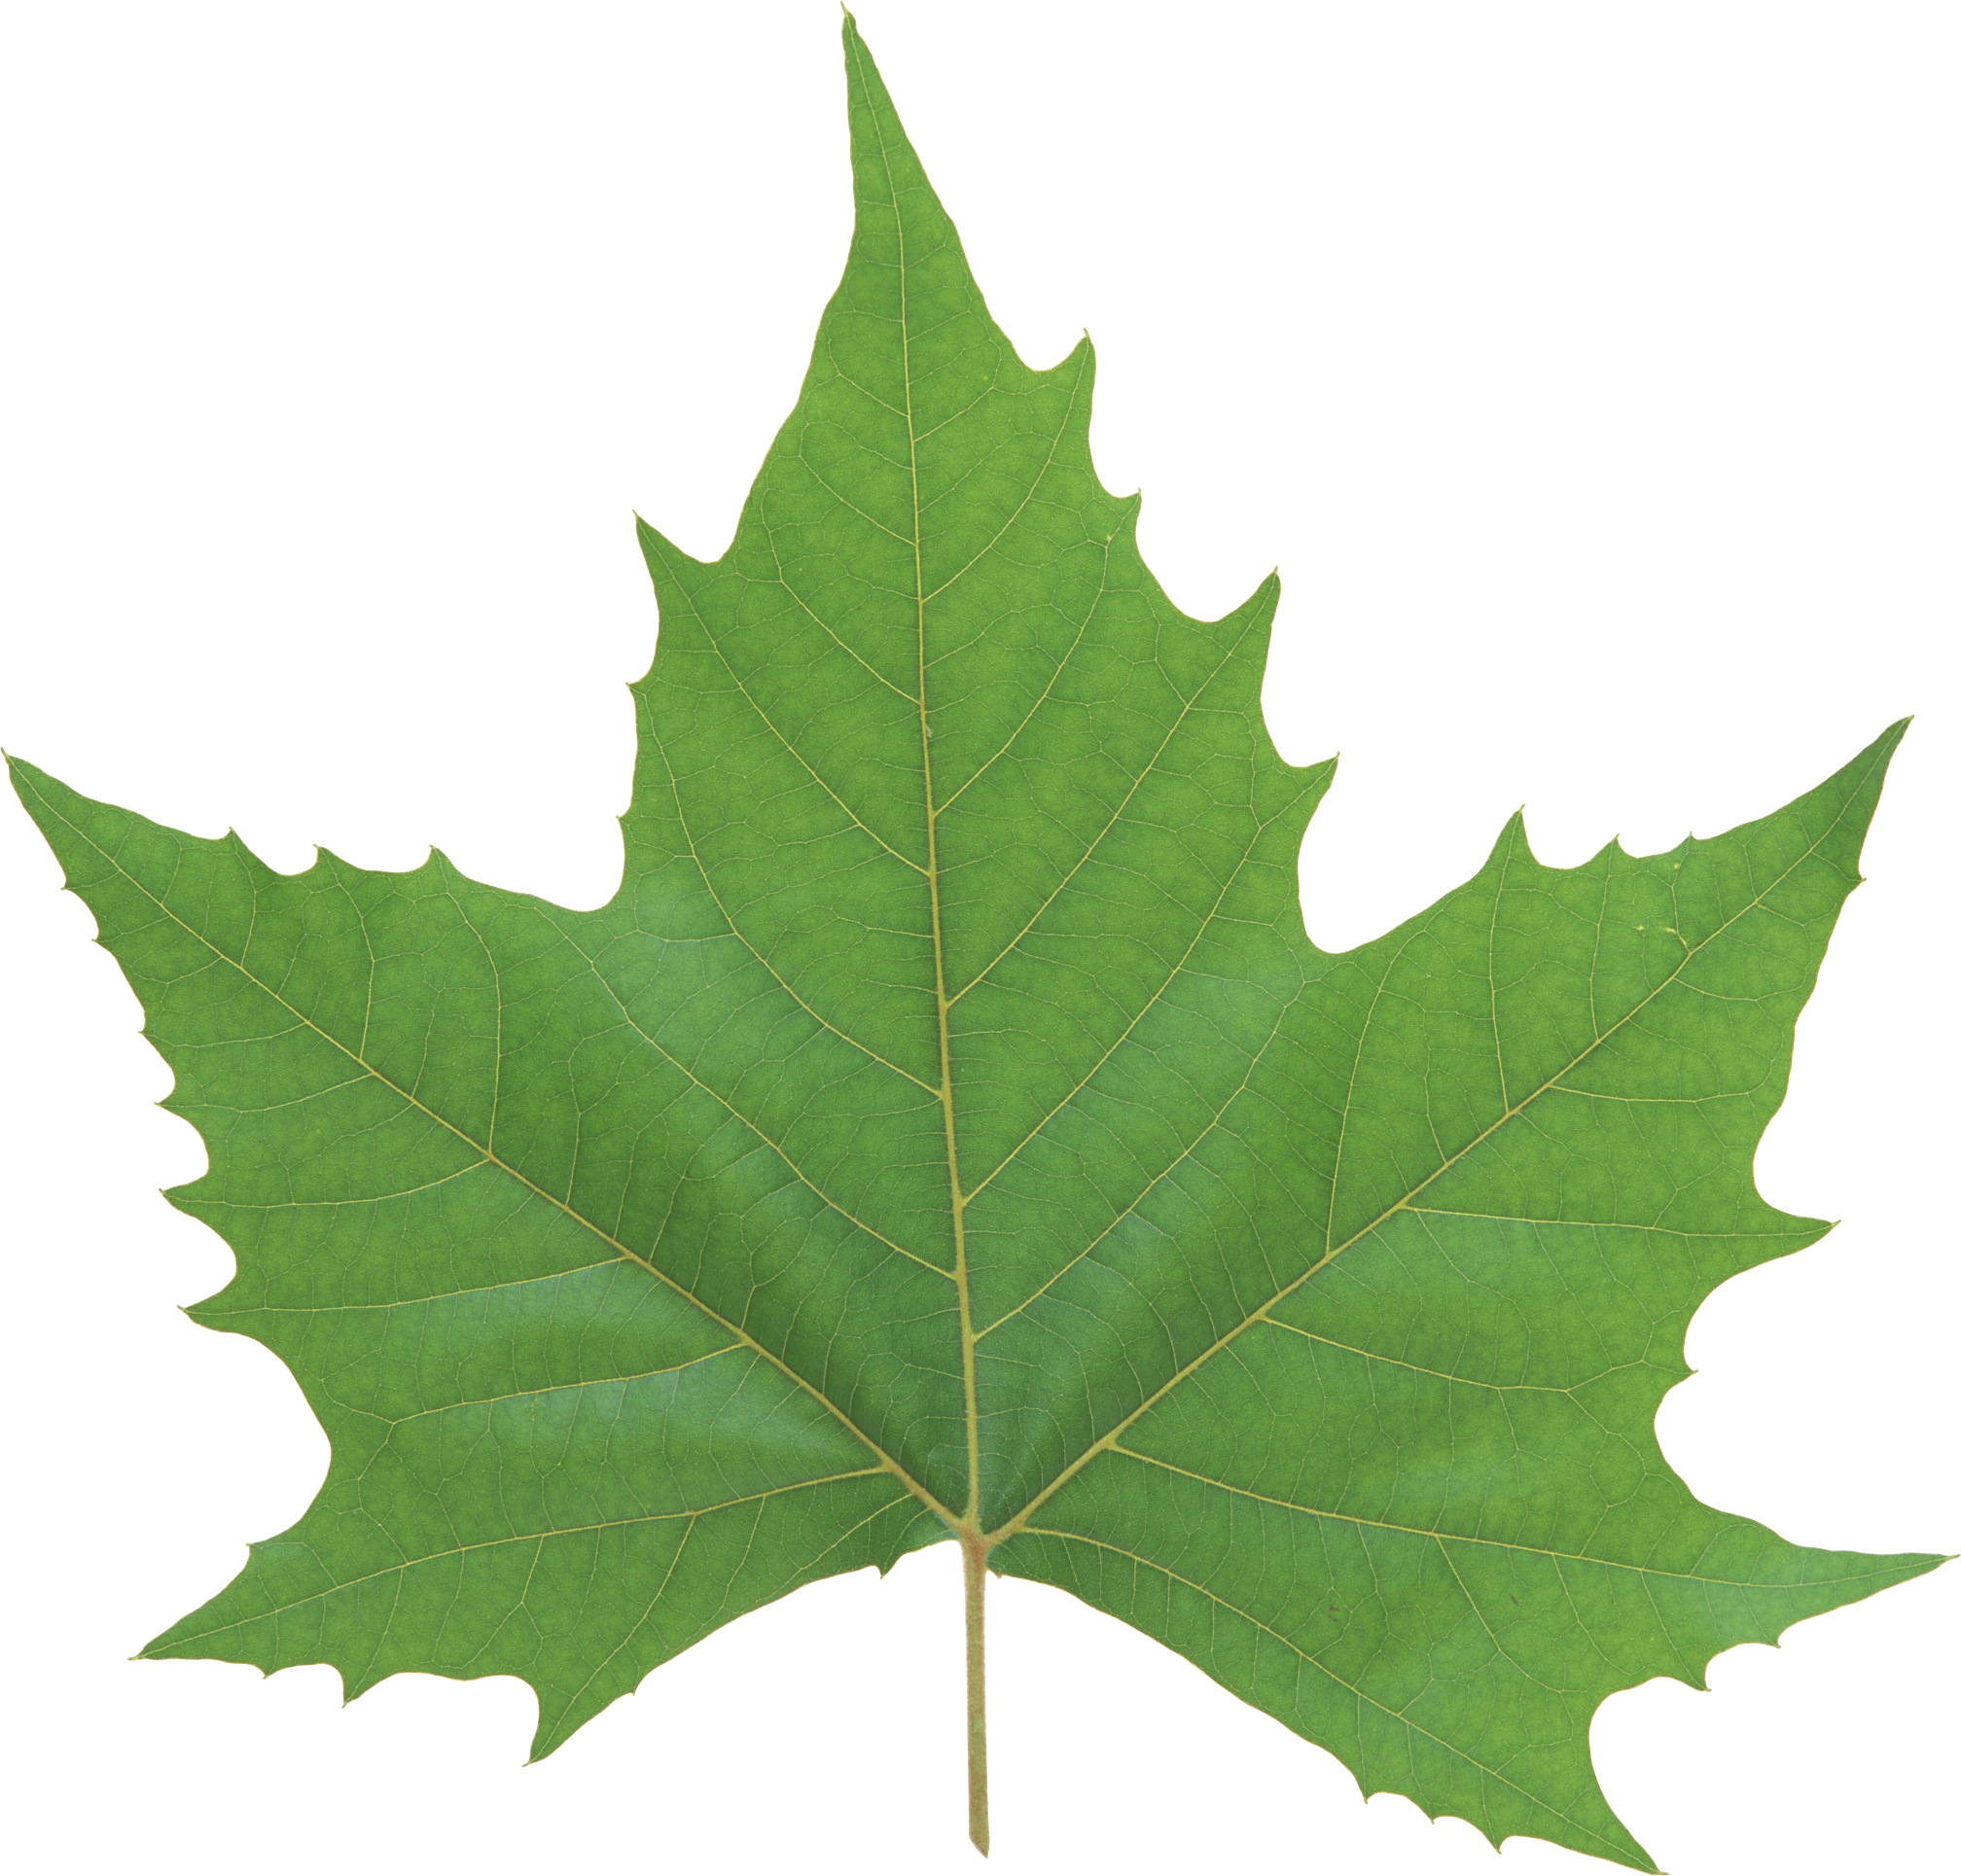 Green Leaves Png Image Leaves Green Leaves Leaves Vector